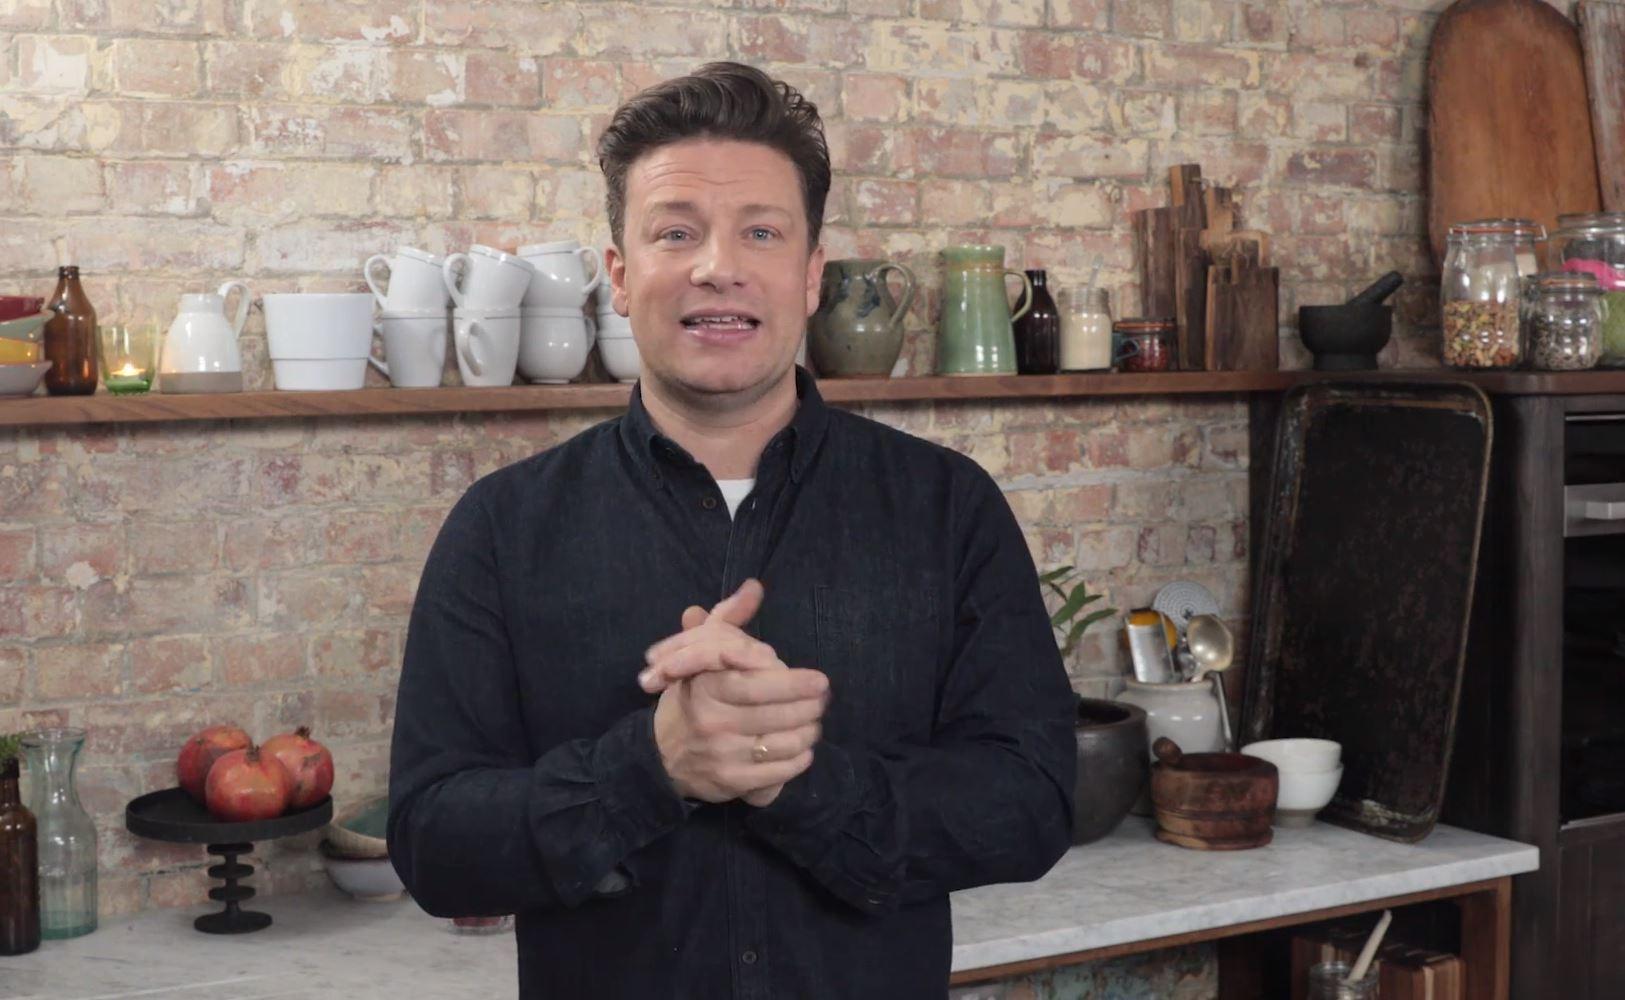 Jamie Oliver opent Pizzeria in de Koningstraat in Arnhem